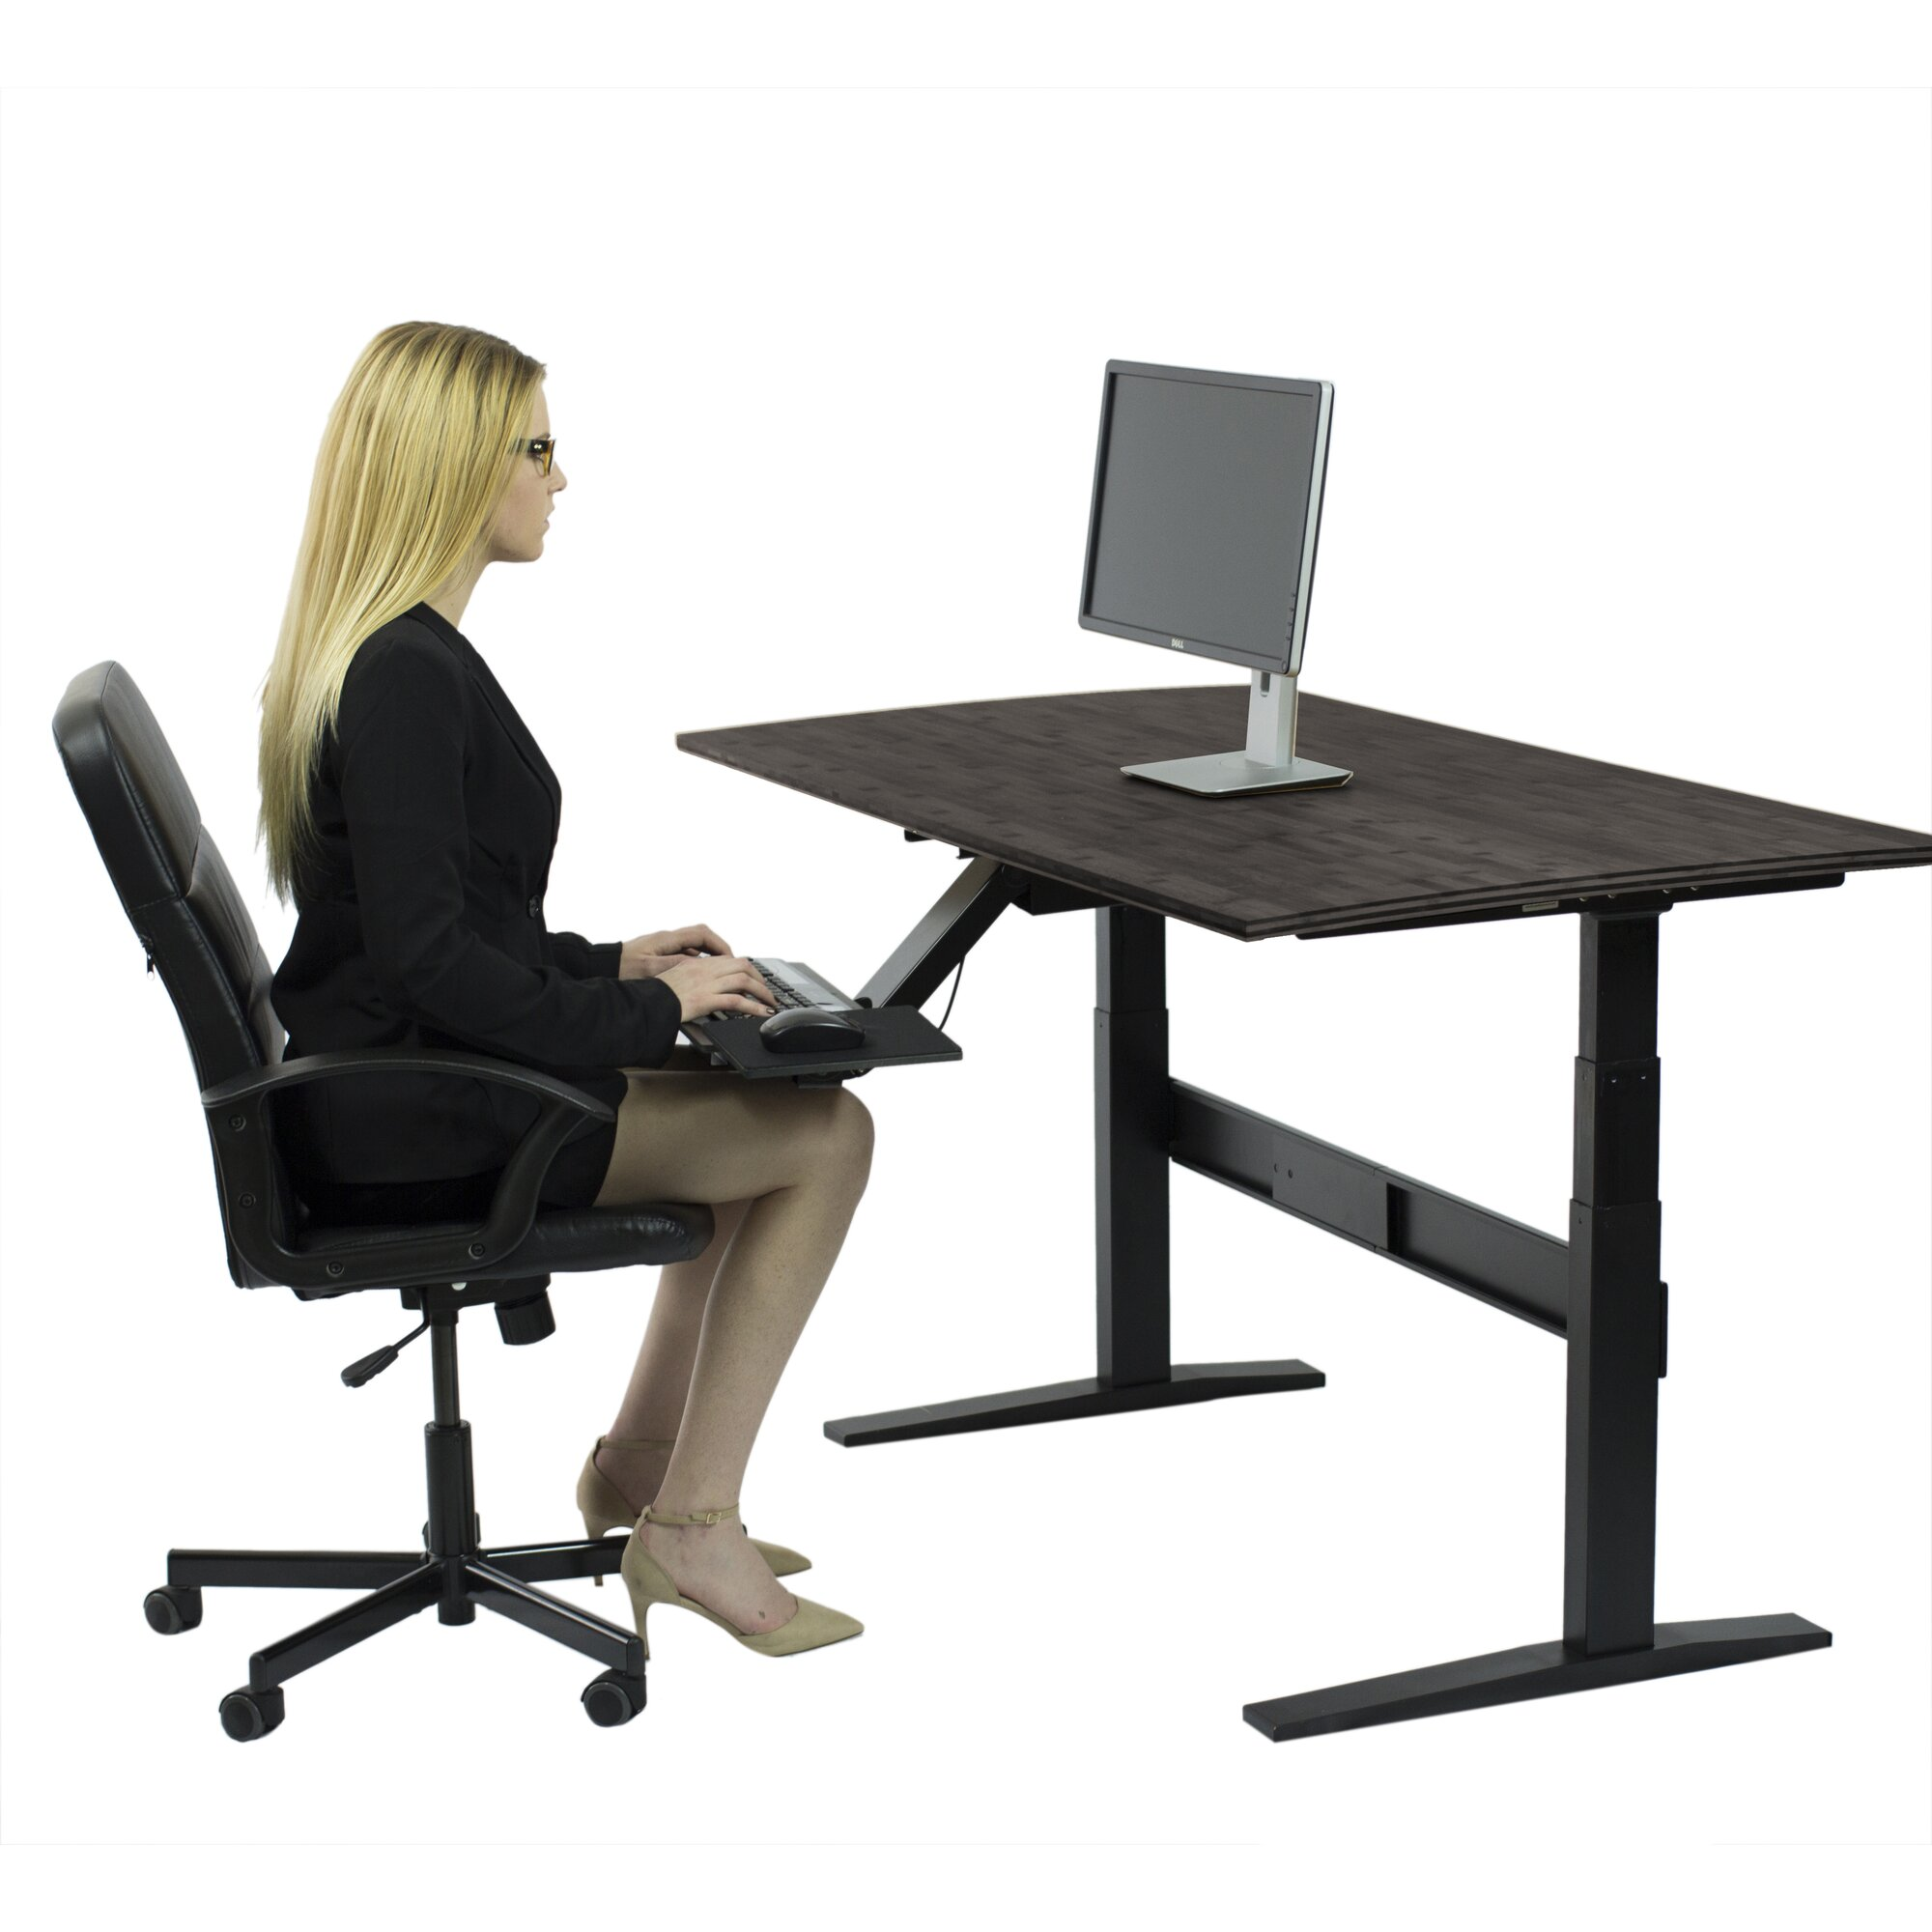 Uncaged Ergonomics Rise Up Standing Desk Amp Reviews Wayfair